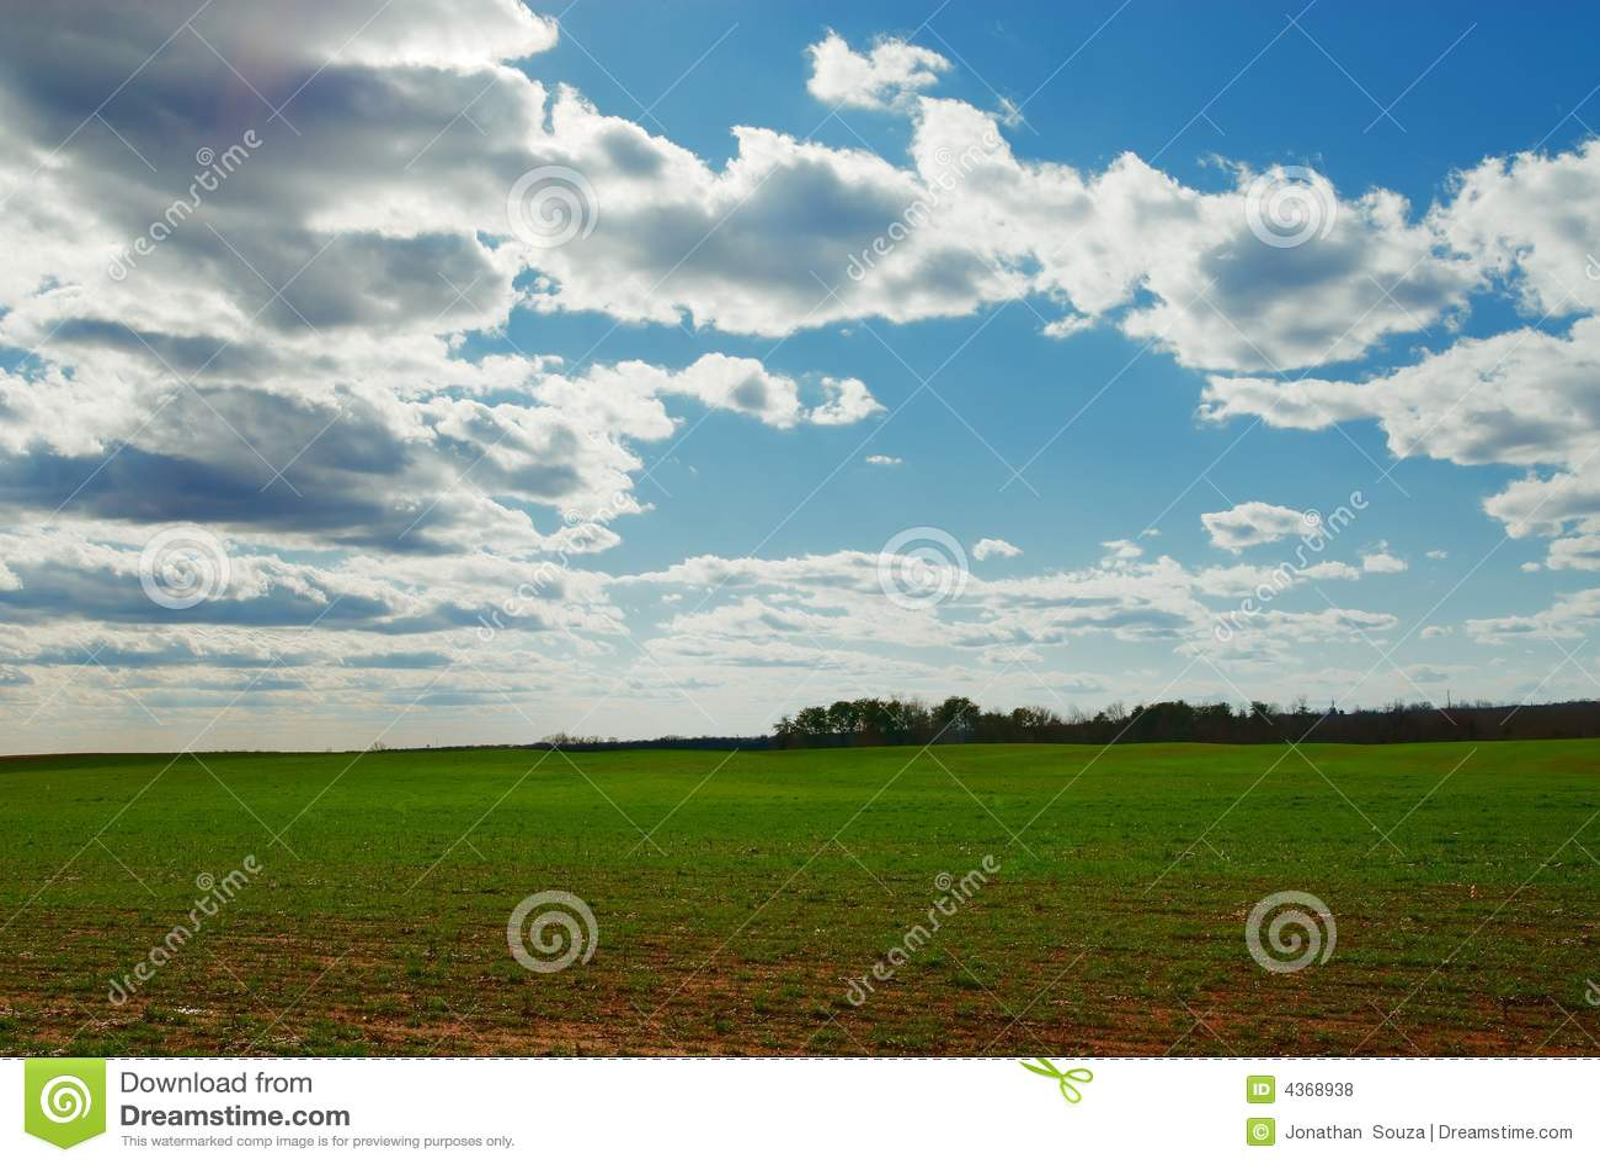 Farmer s dreams